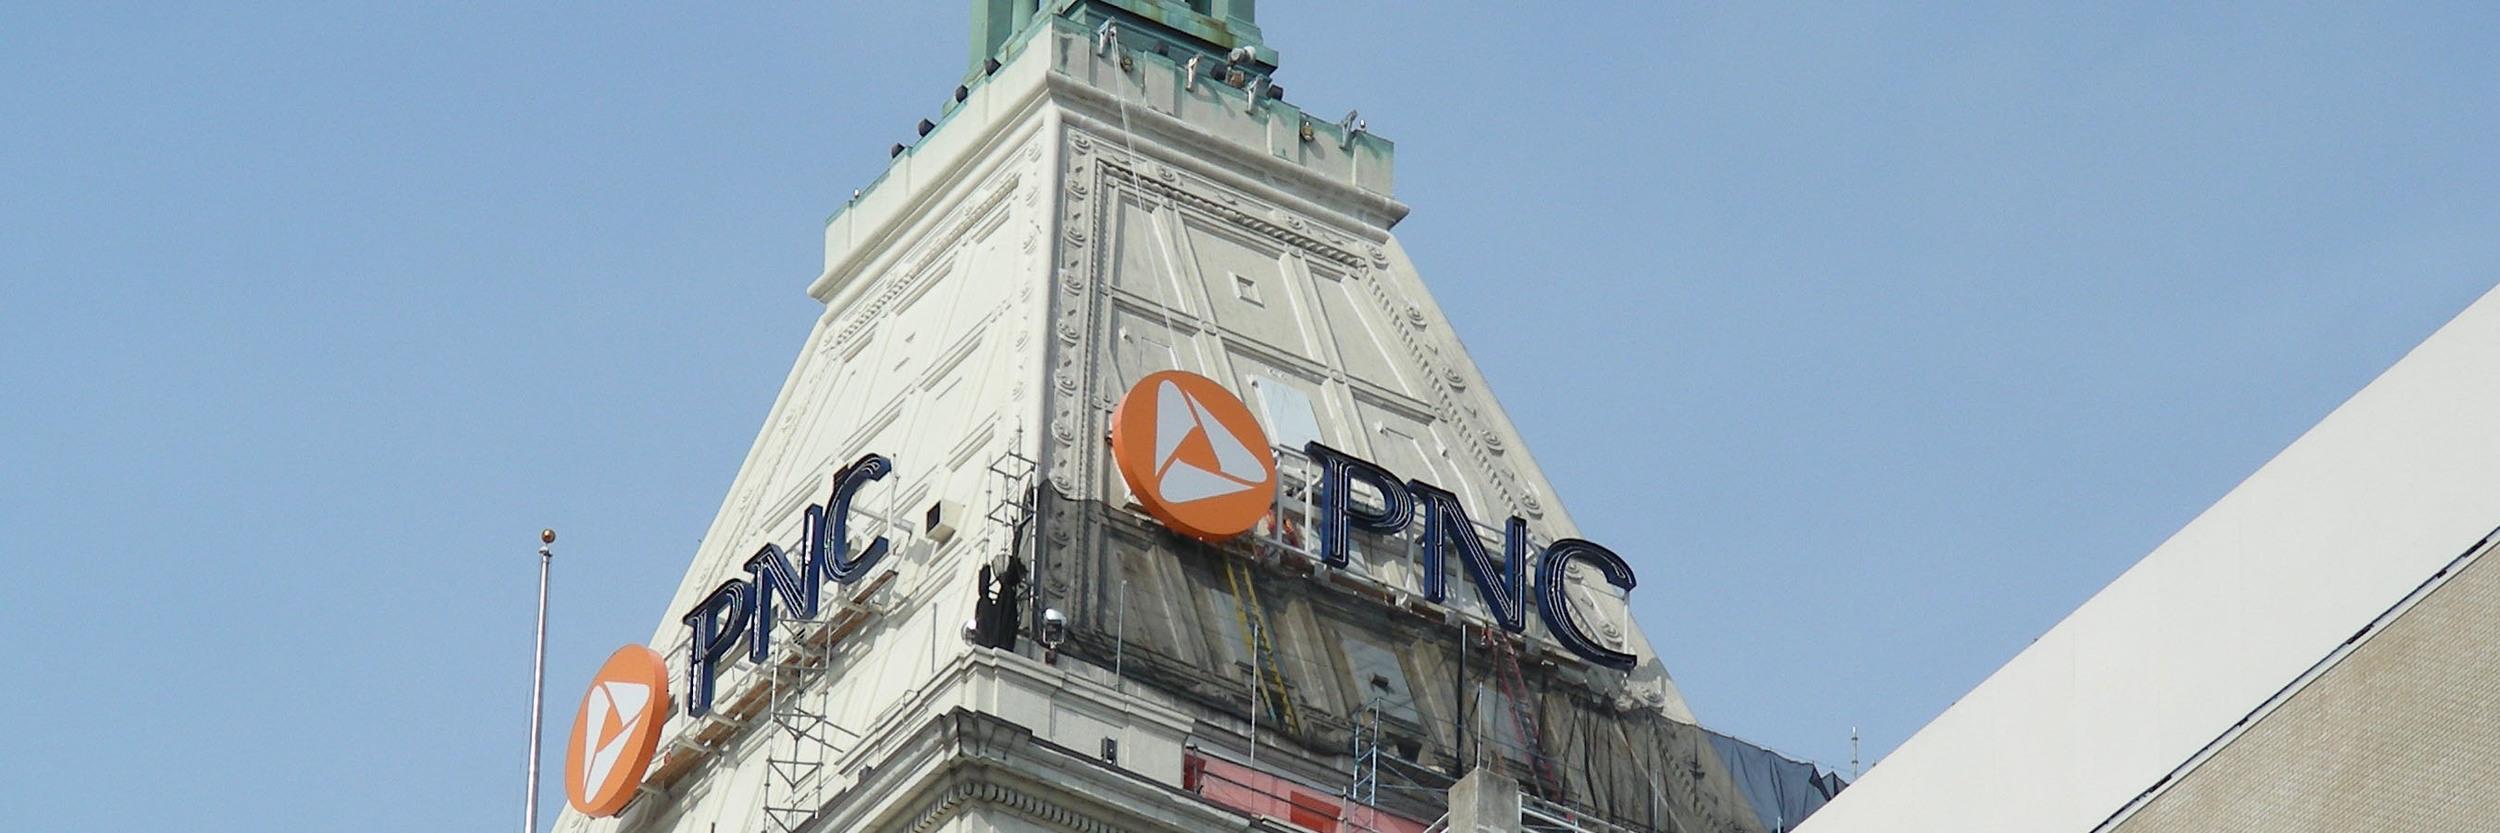 PNC Tower Slope Coating